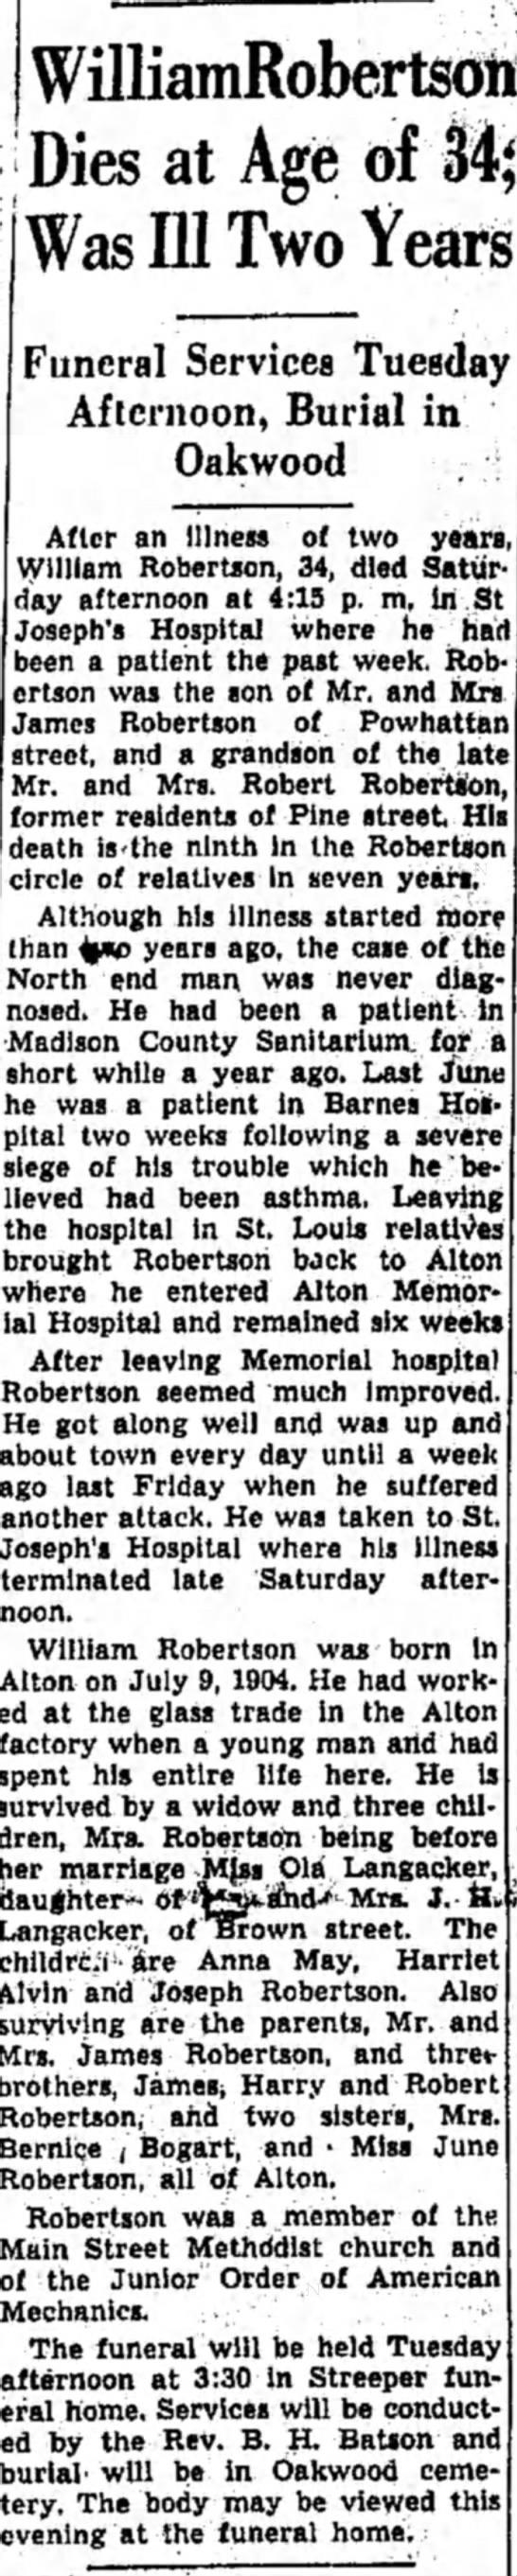 William Robertson 26 Sept 1938 - WilliamRobertsoli -•T\\ao at A tf £ f\$ JL/lCo...